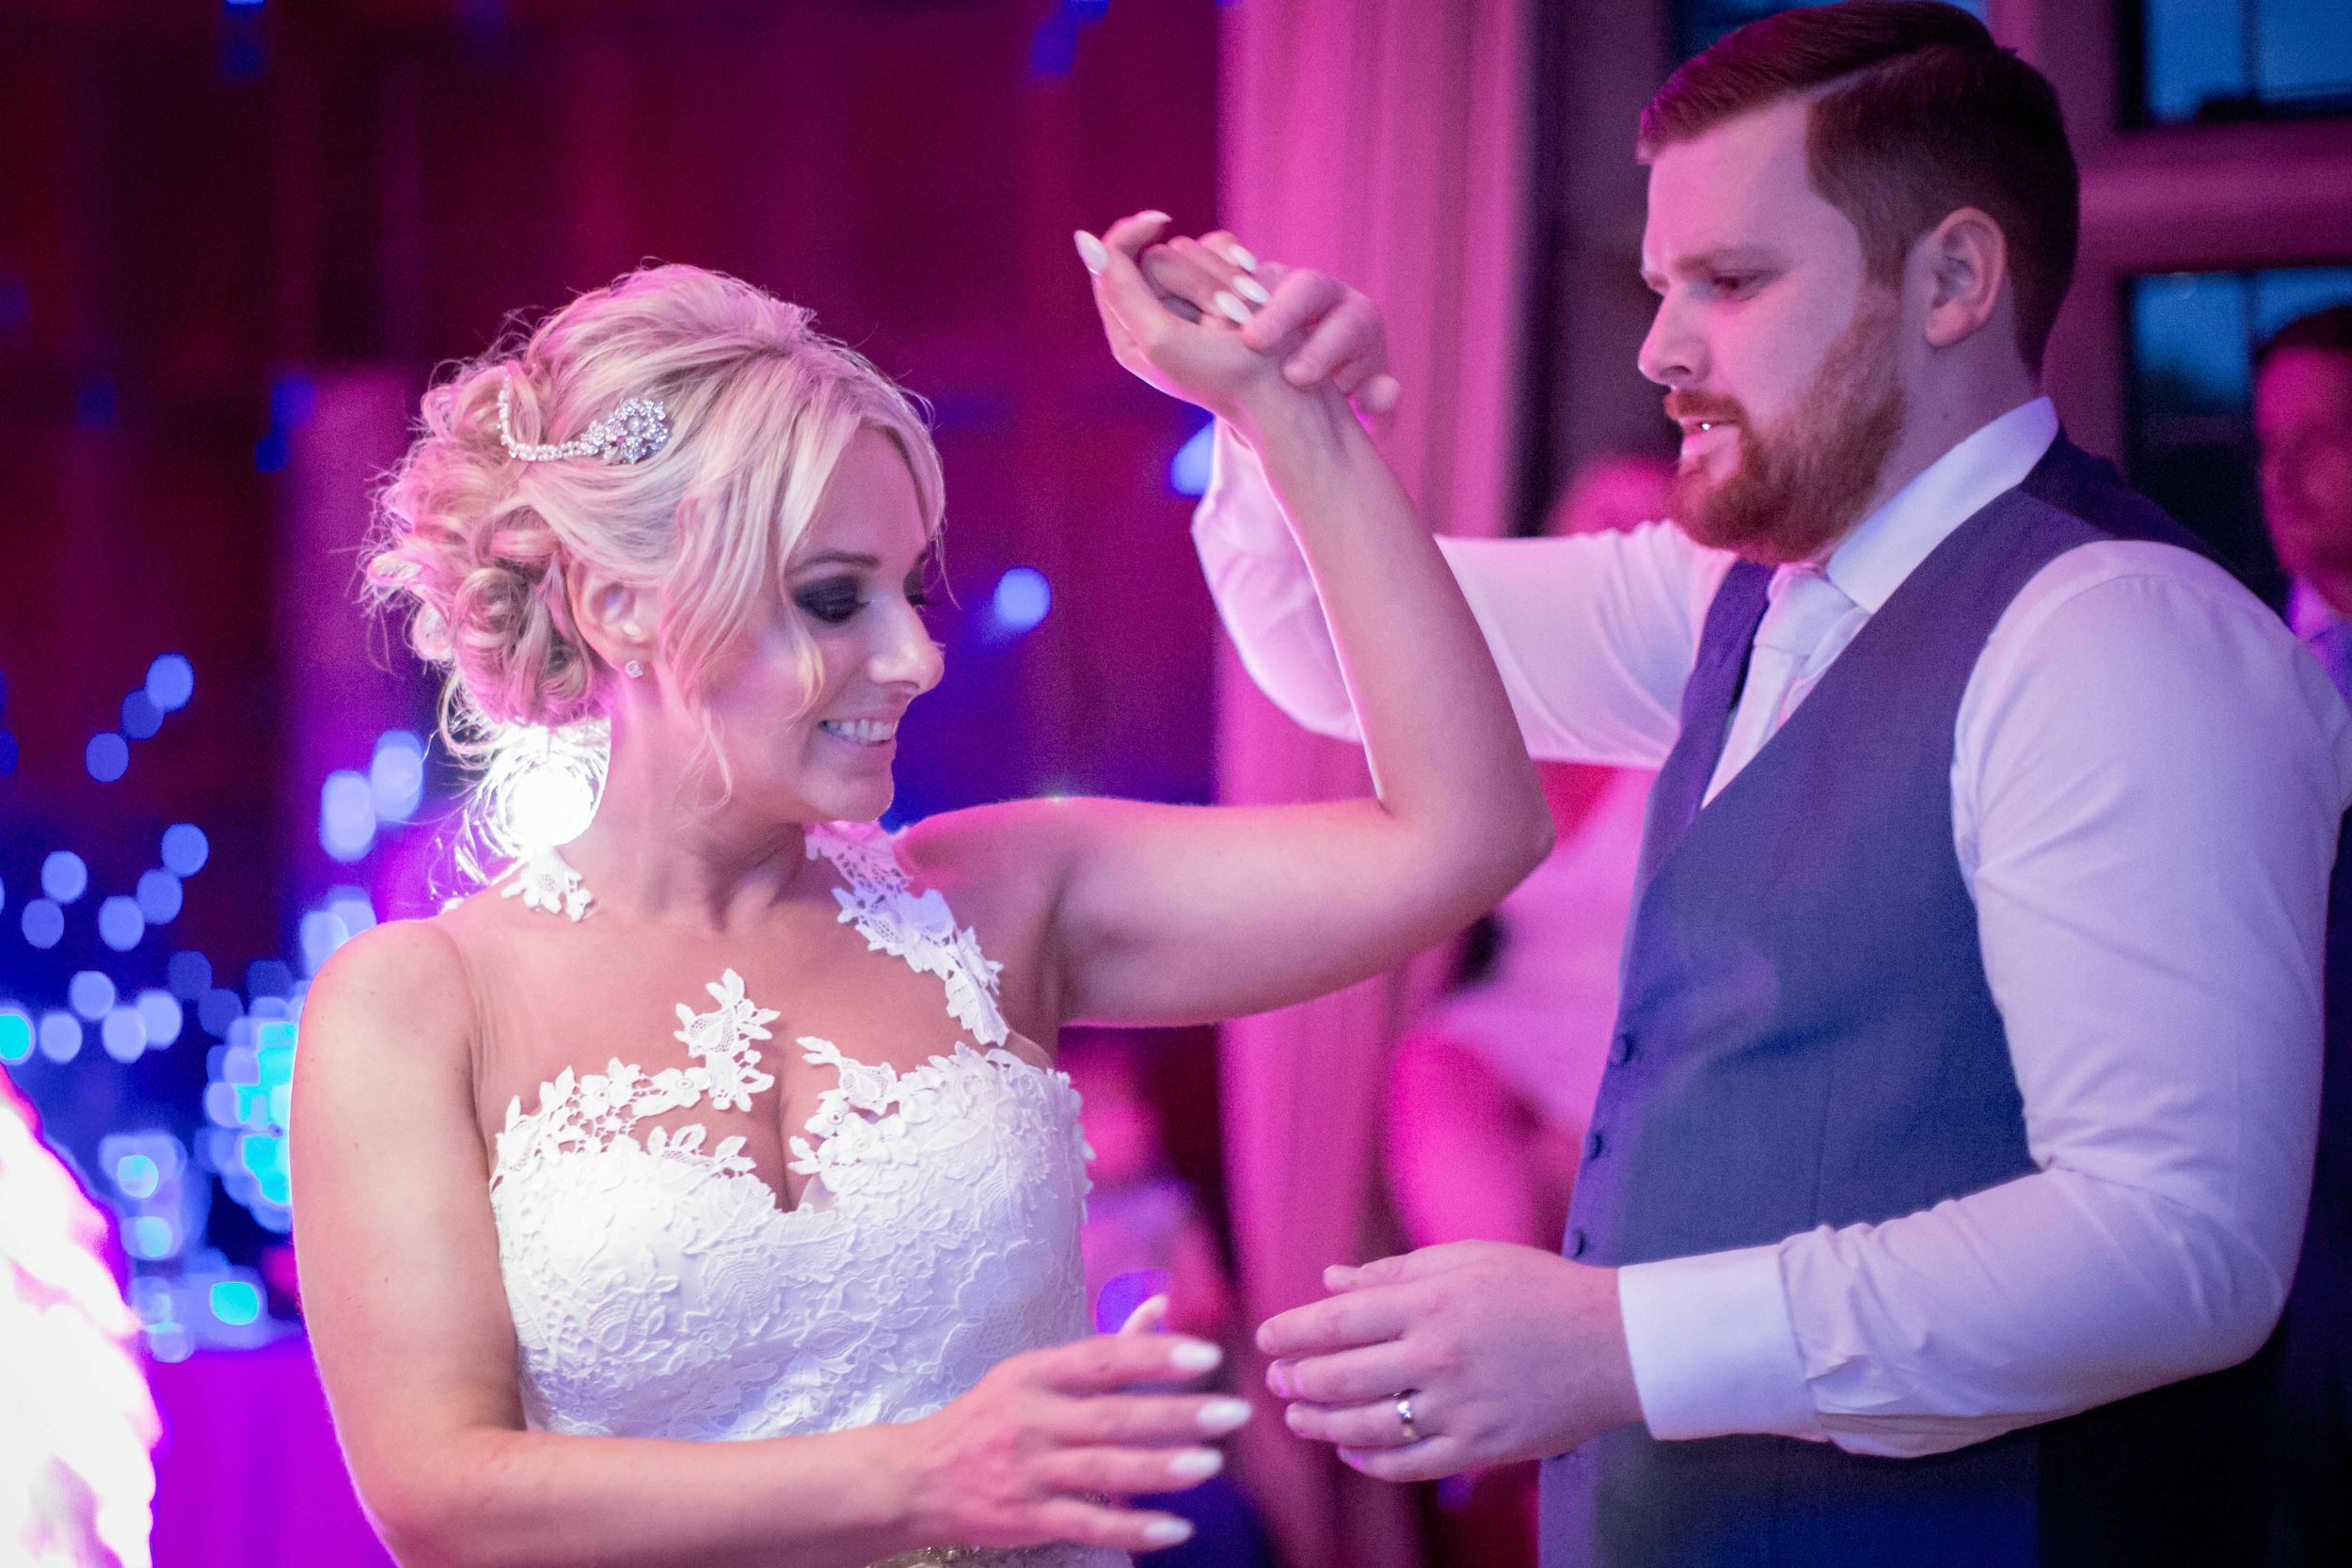 cotswold-wedding-photography-at-stonehouse-court-hotel-natalia-smith-photography-gloucestershire-wedding-photographer-90.jpg